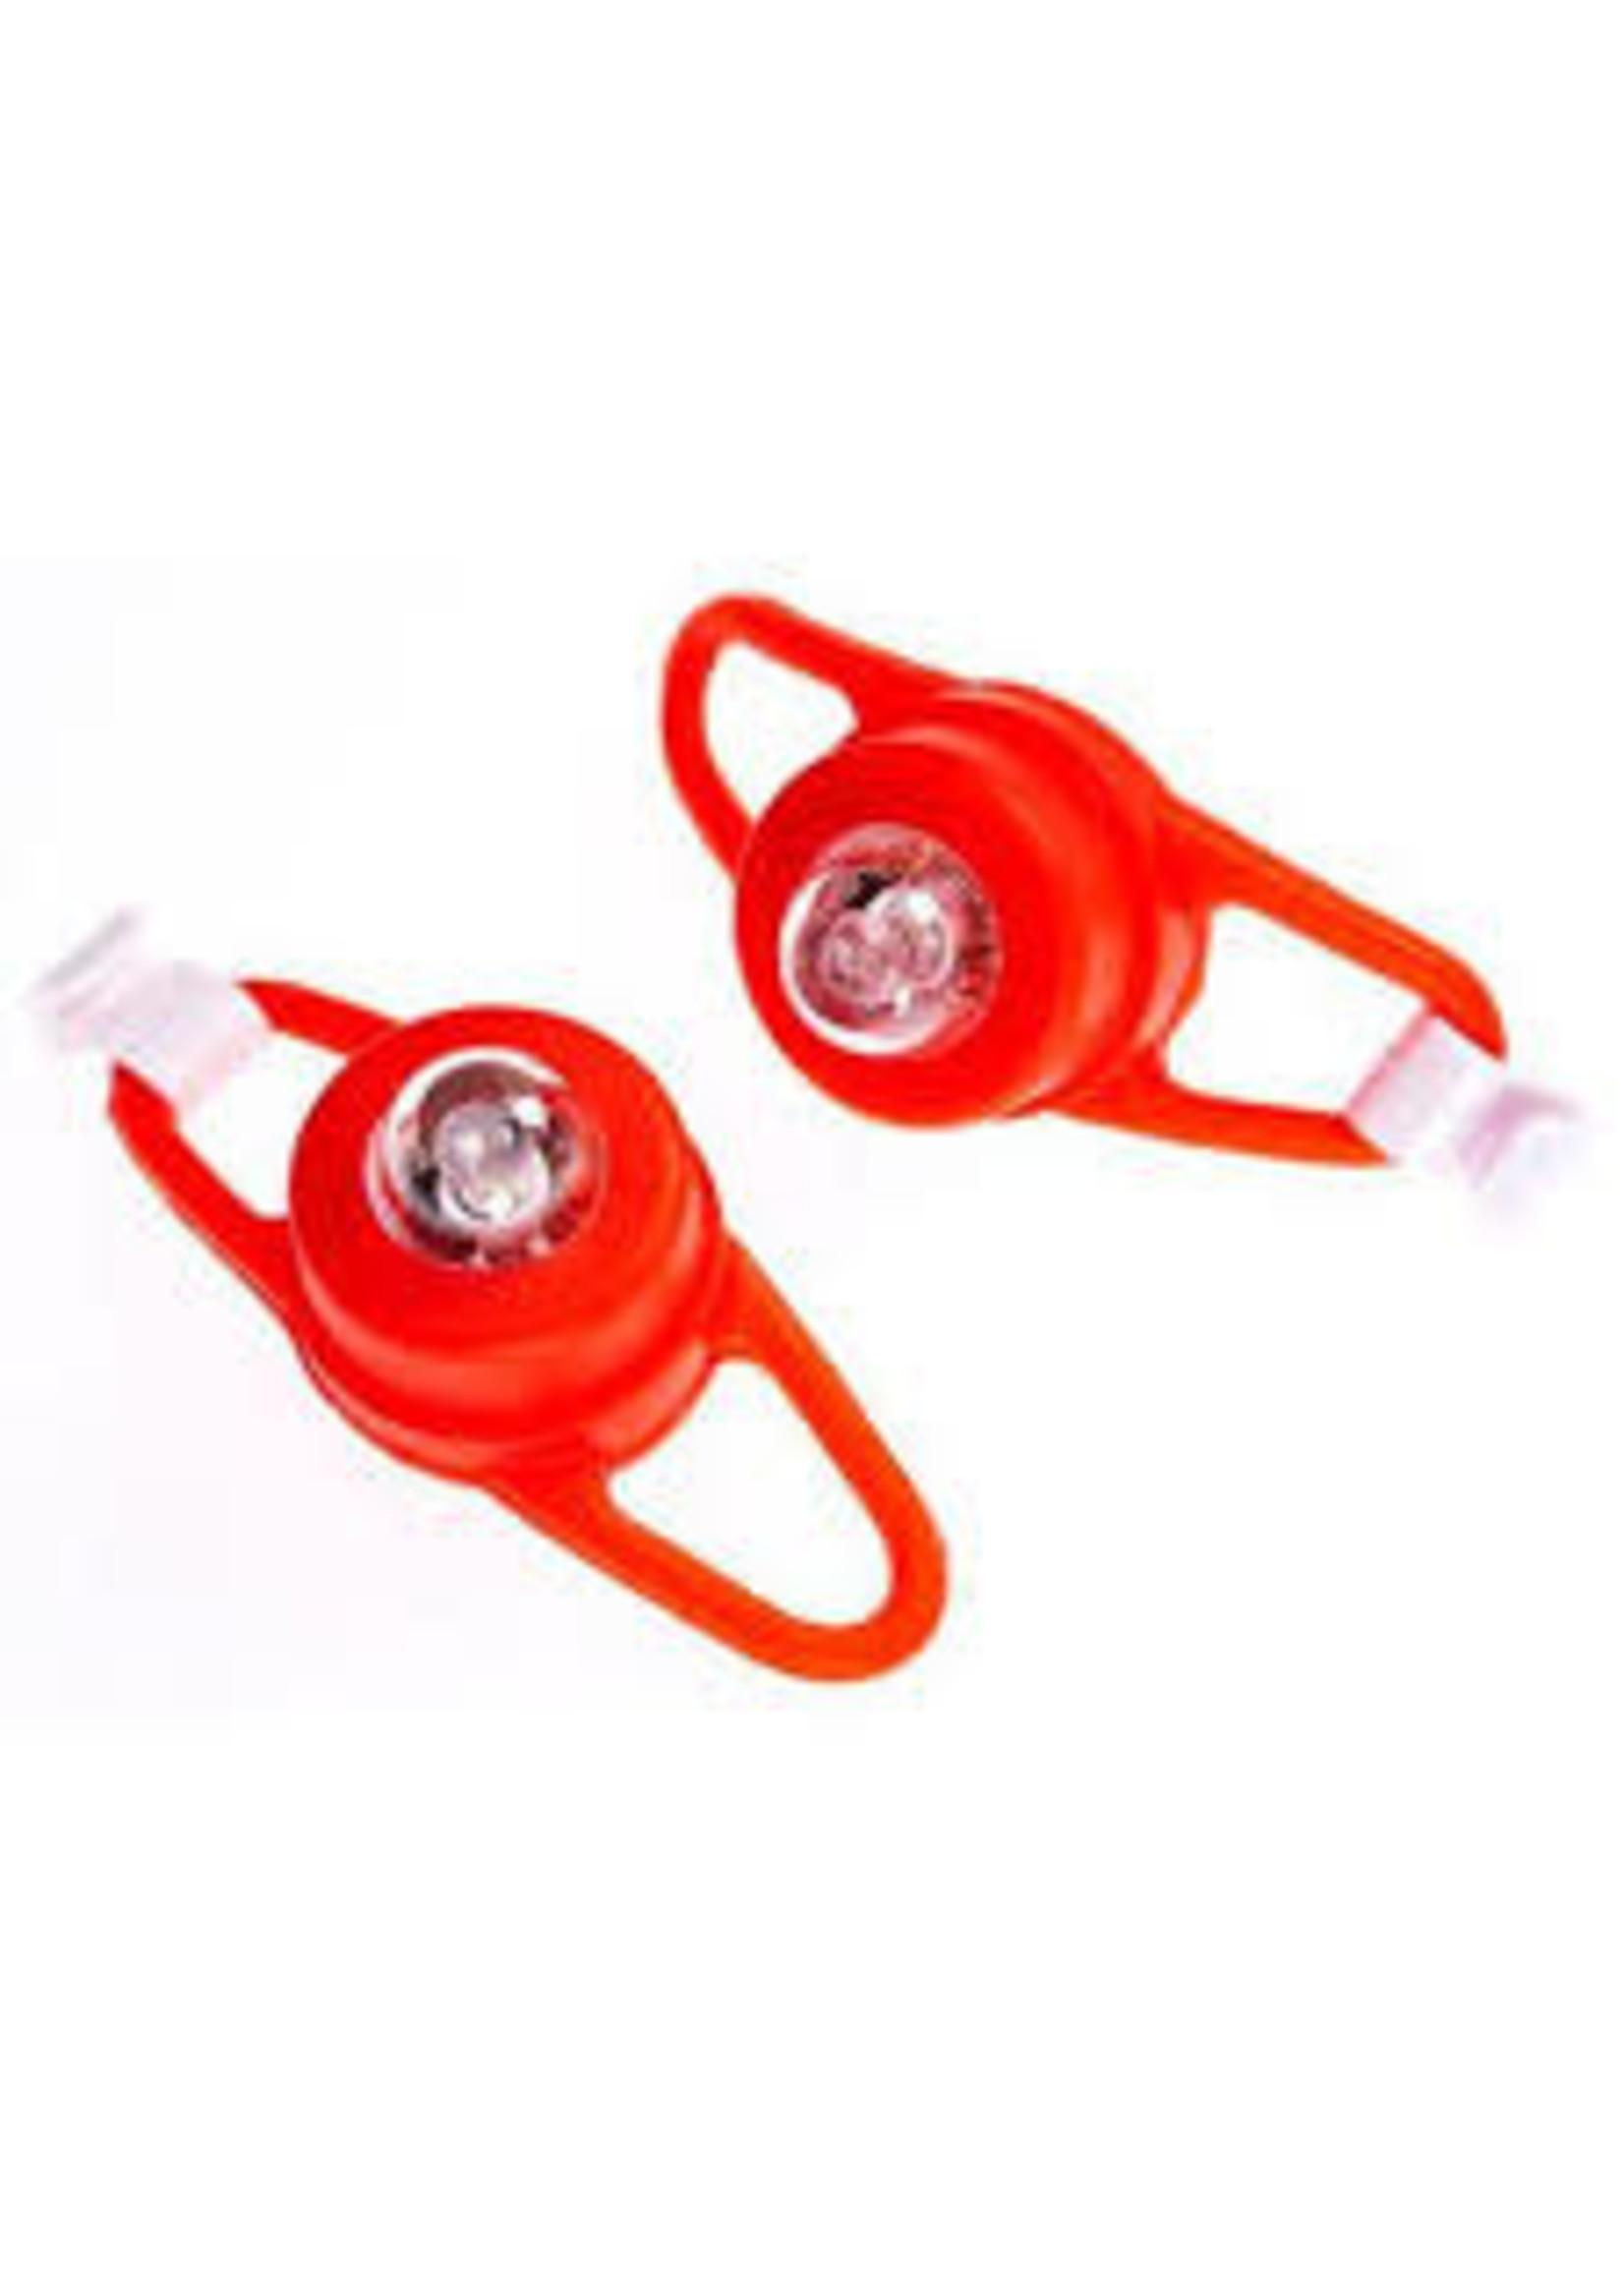 provis buggy lights